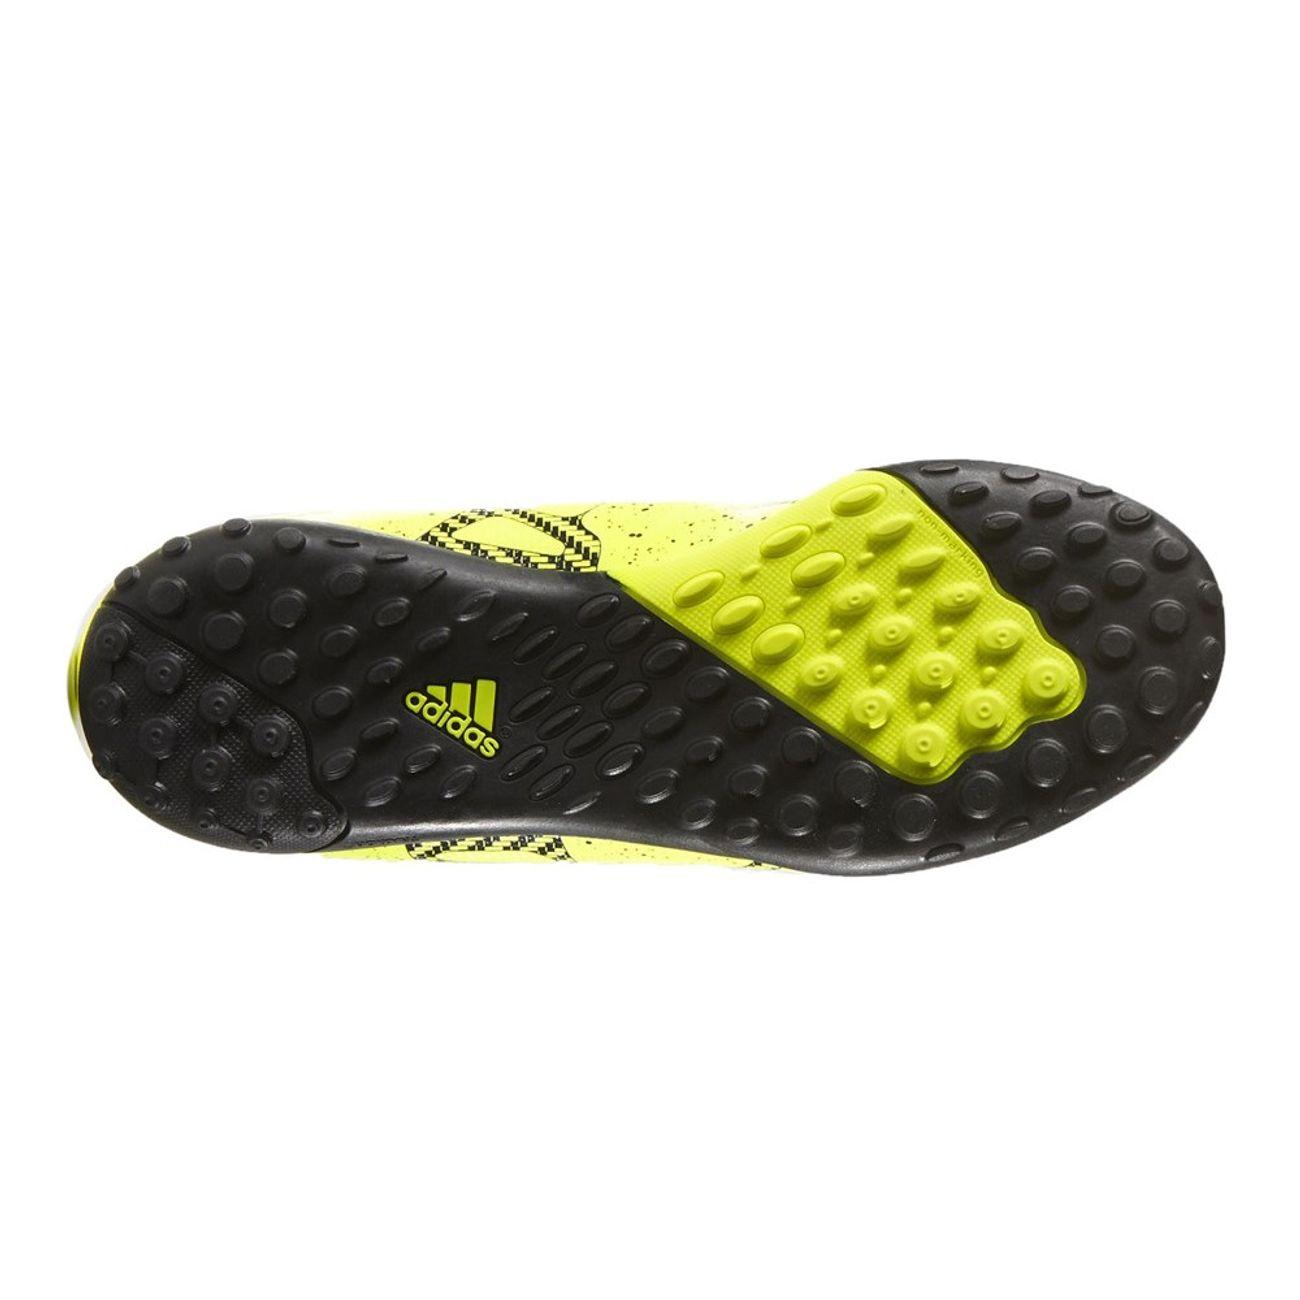 Football enfant ADIDAS Adidas X 154 TF J